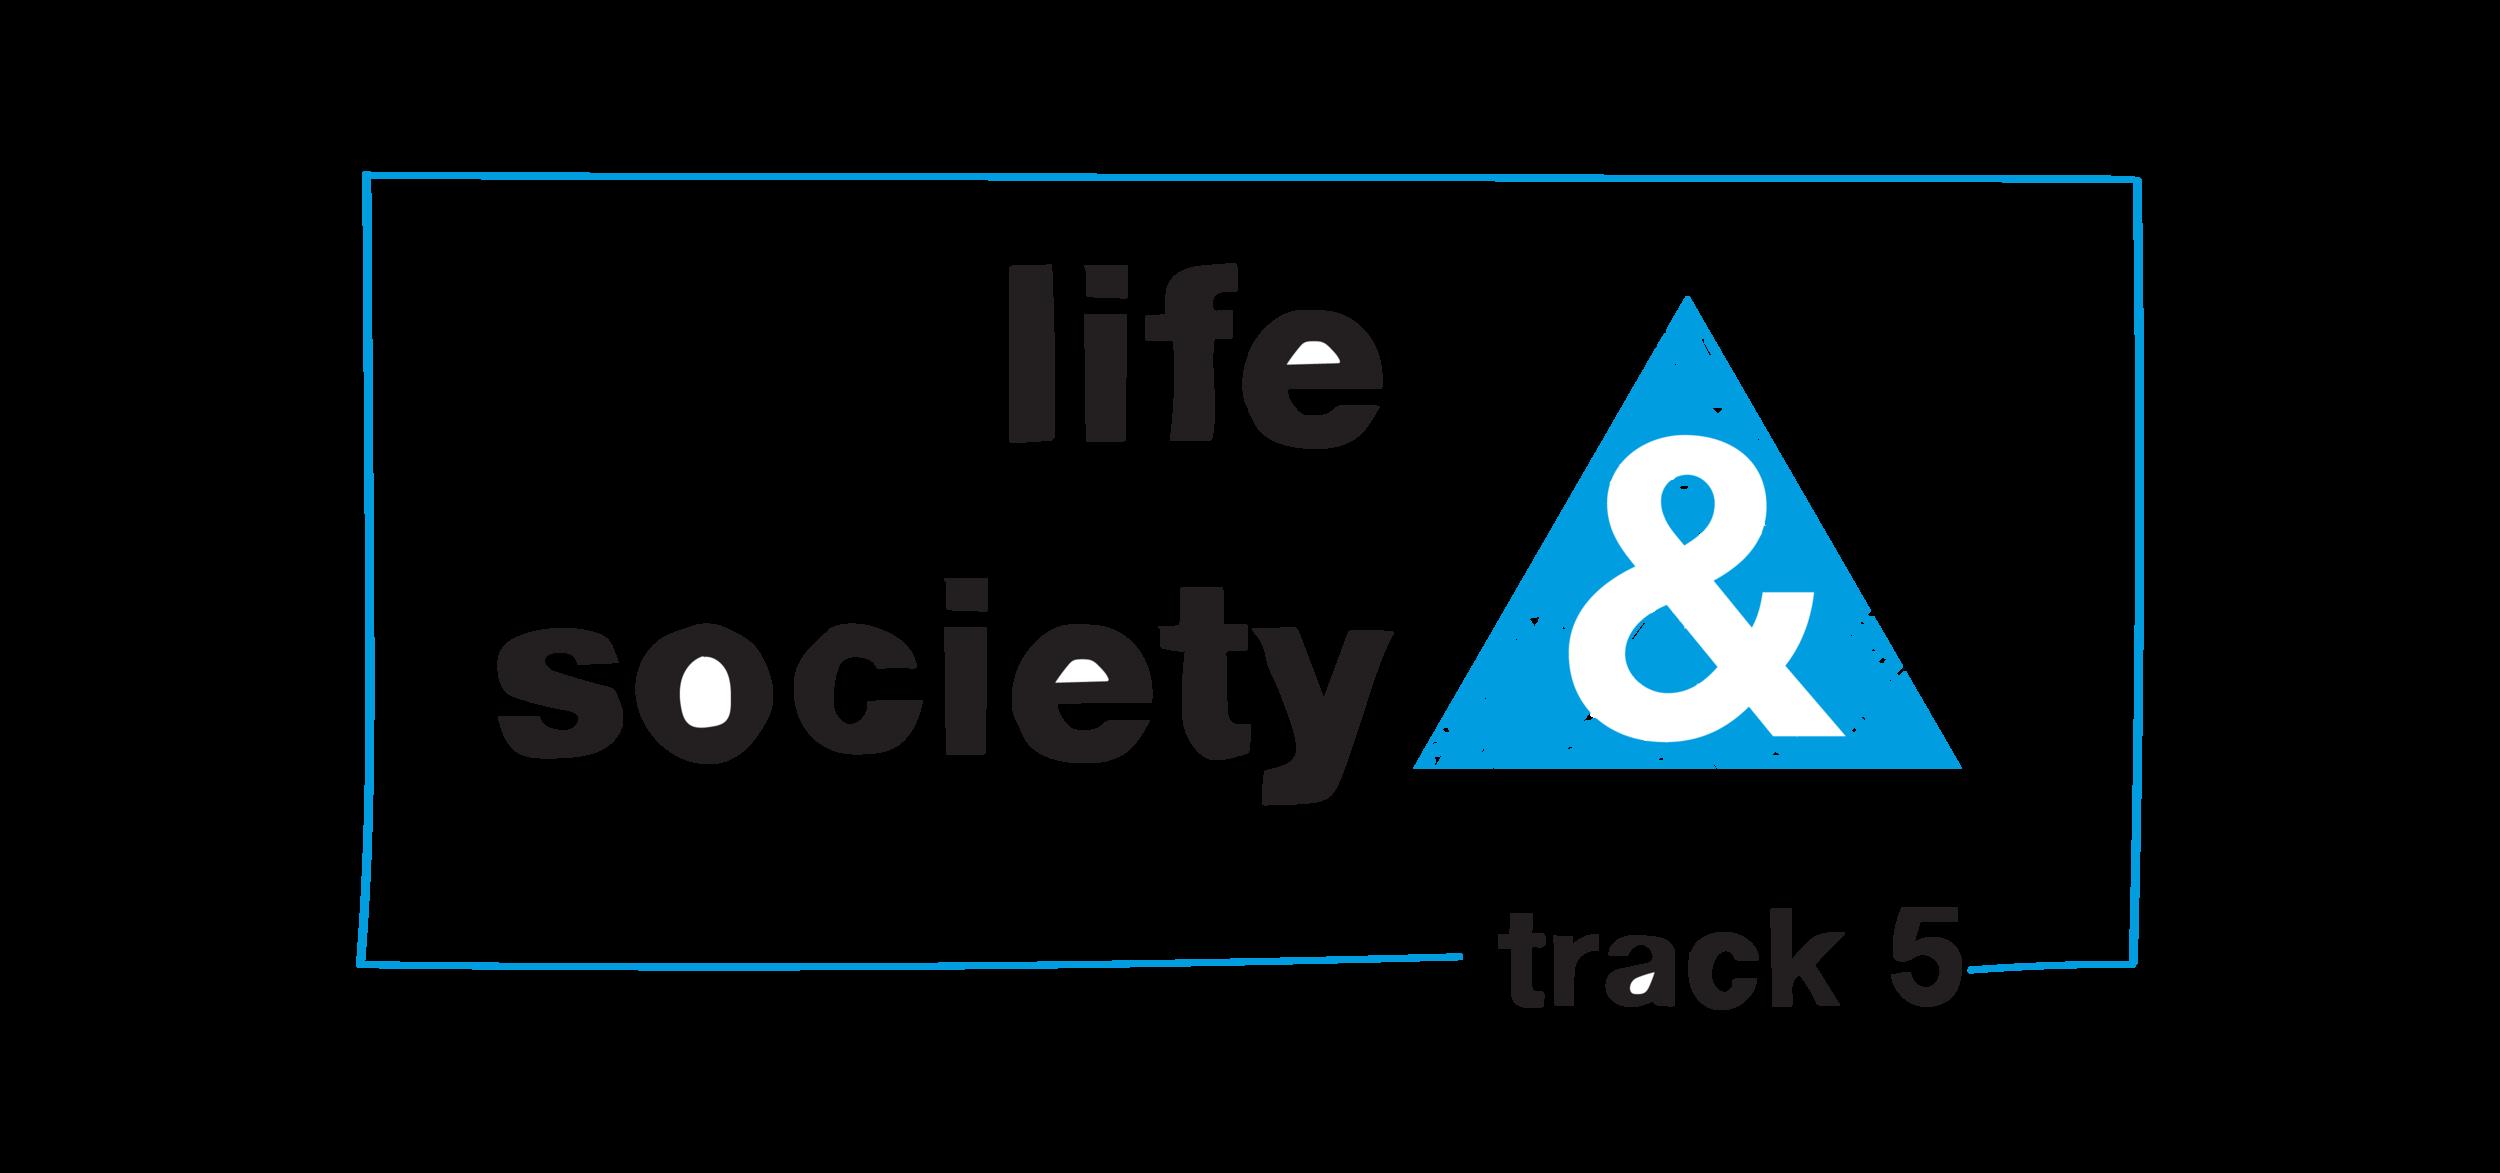 Rebranding Creativity_Tracks-11.png